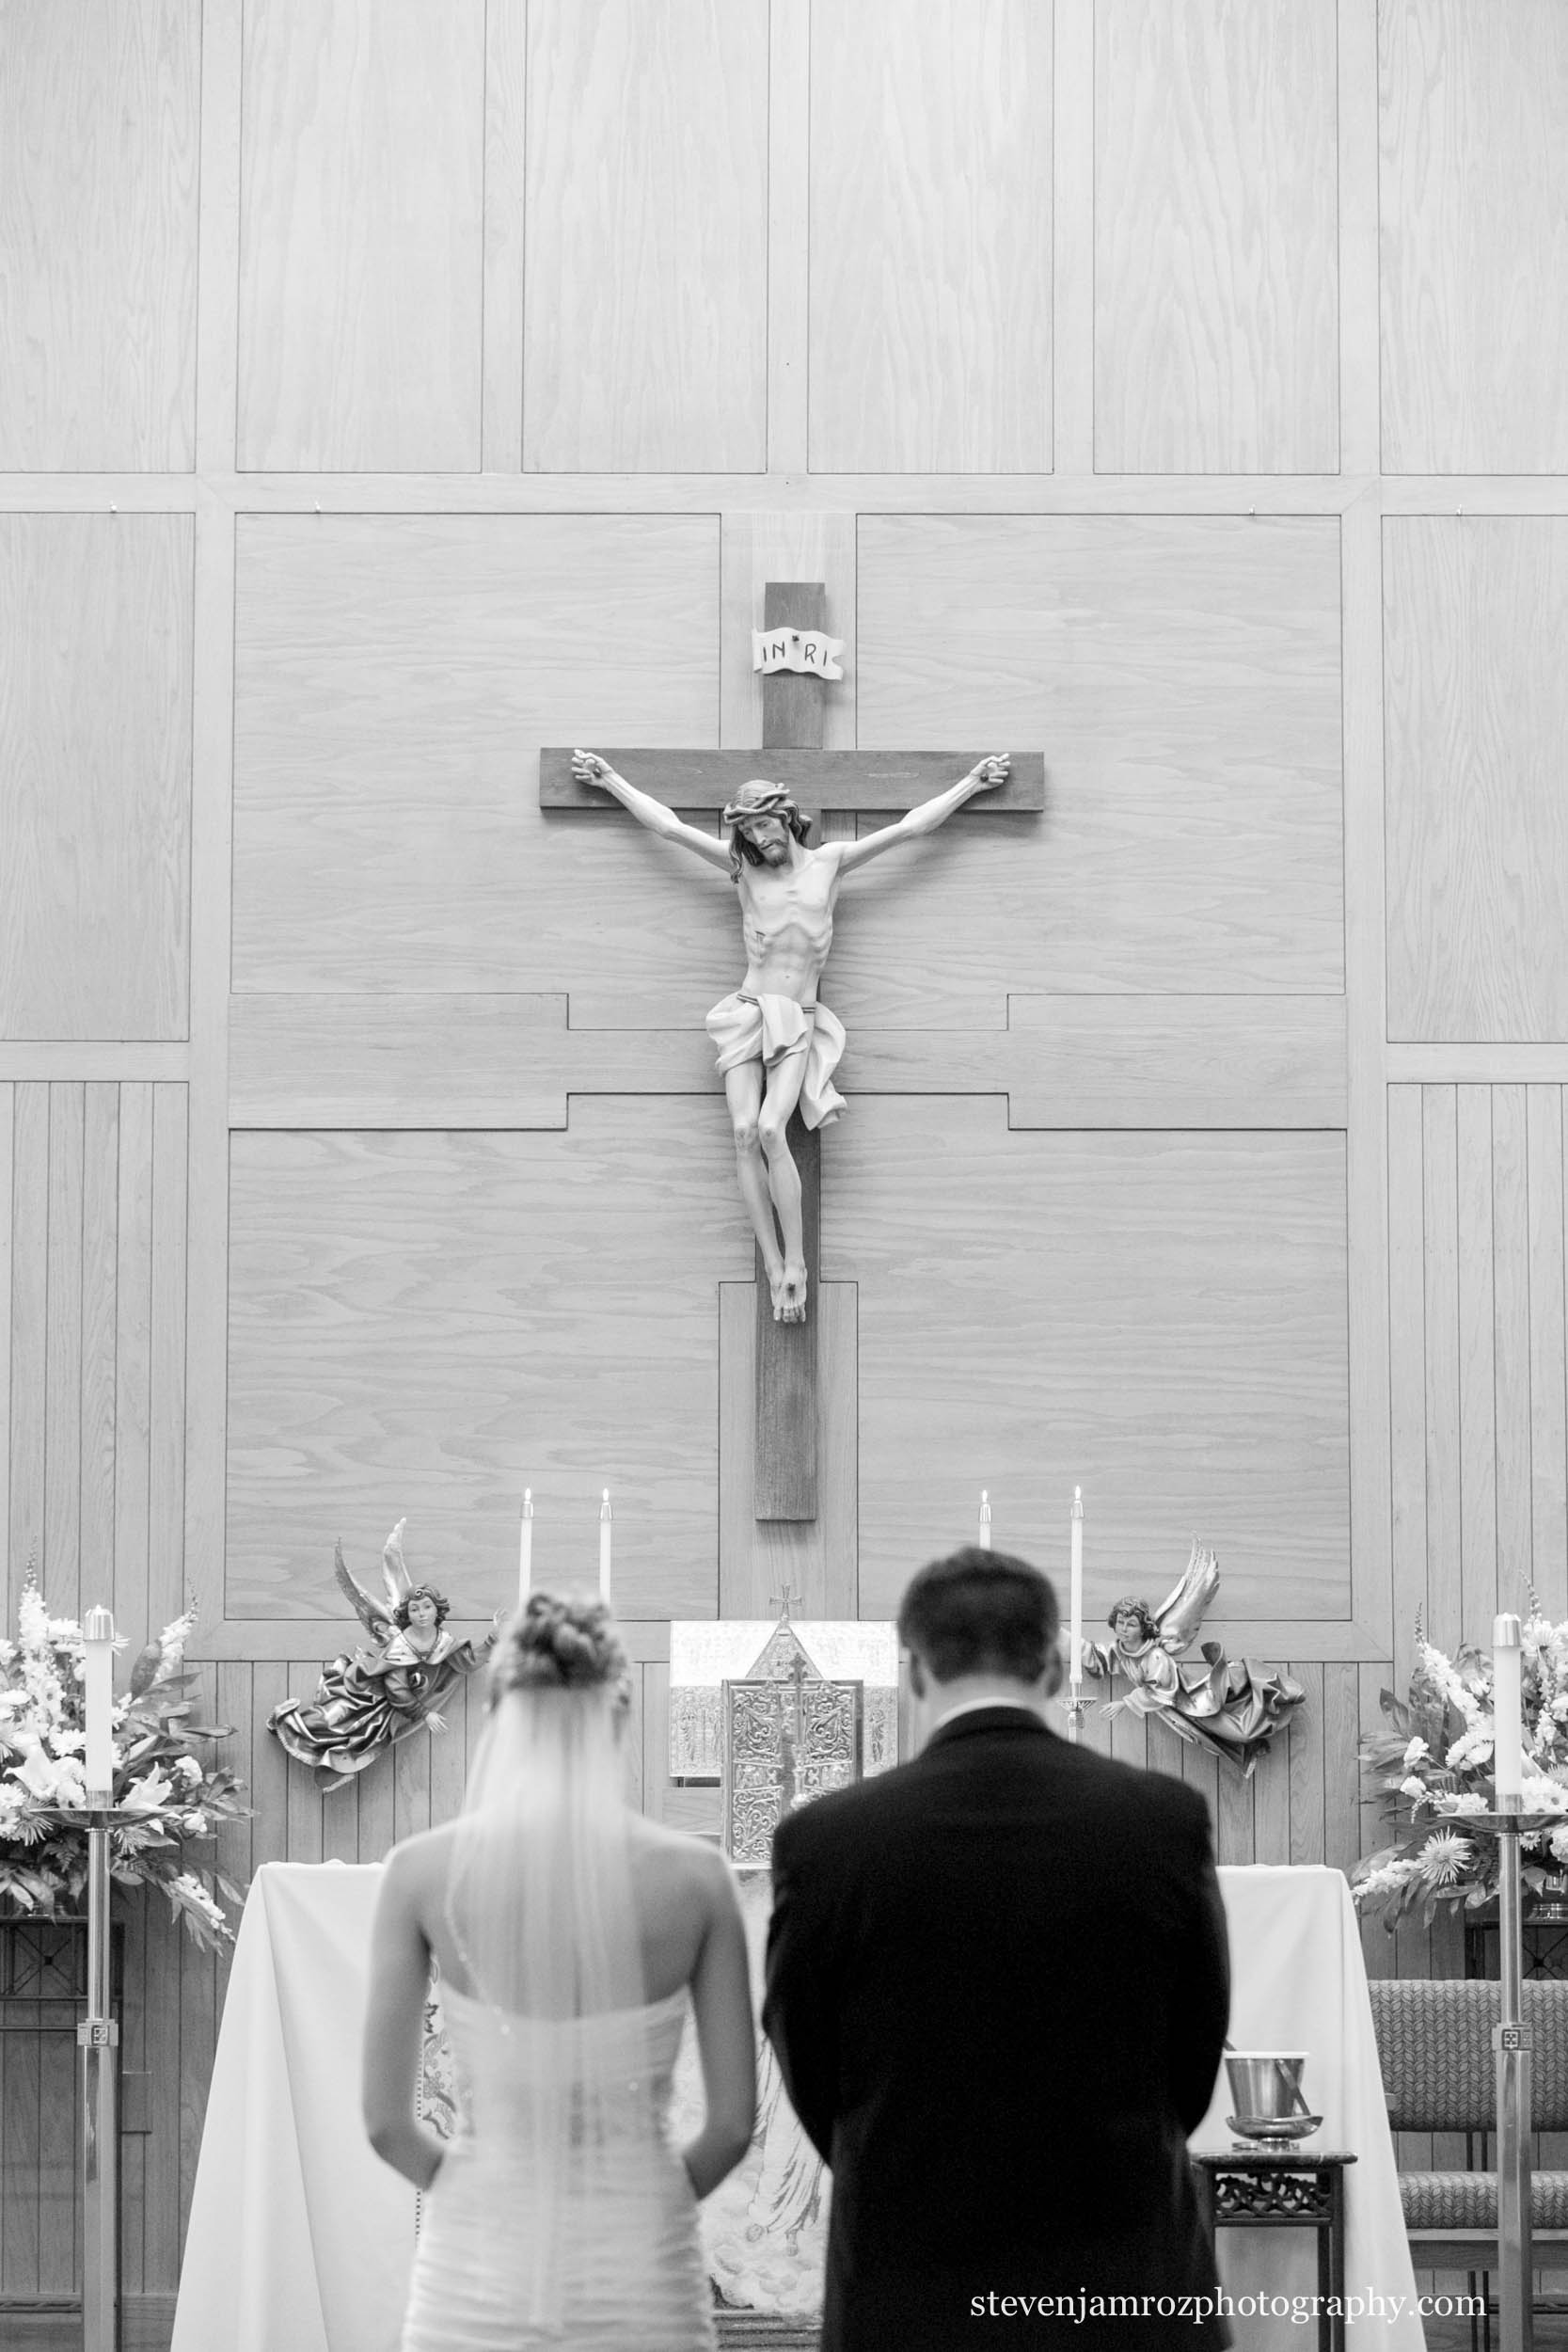 lady-of-lourdes-wedding-kneeling-couple-steven-jamroz-0697.jpg